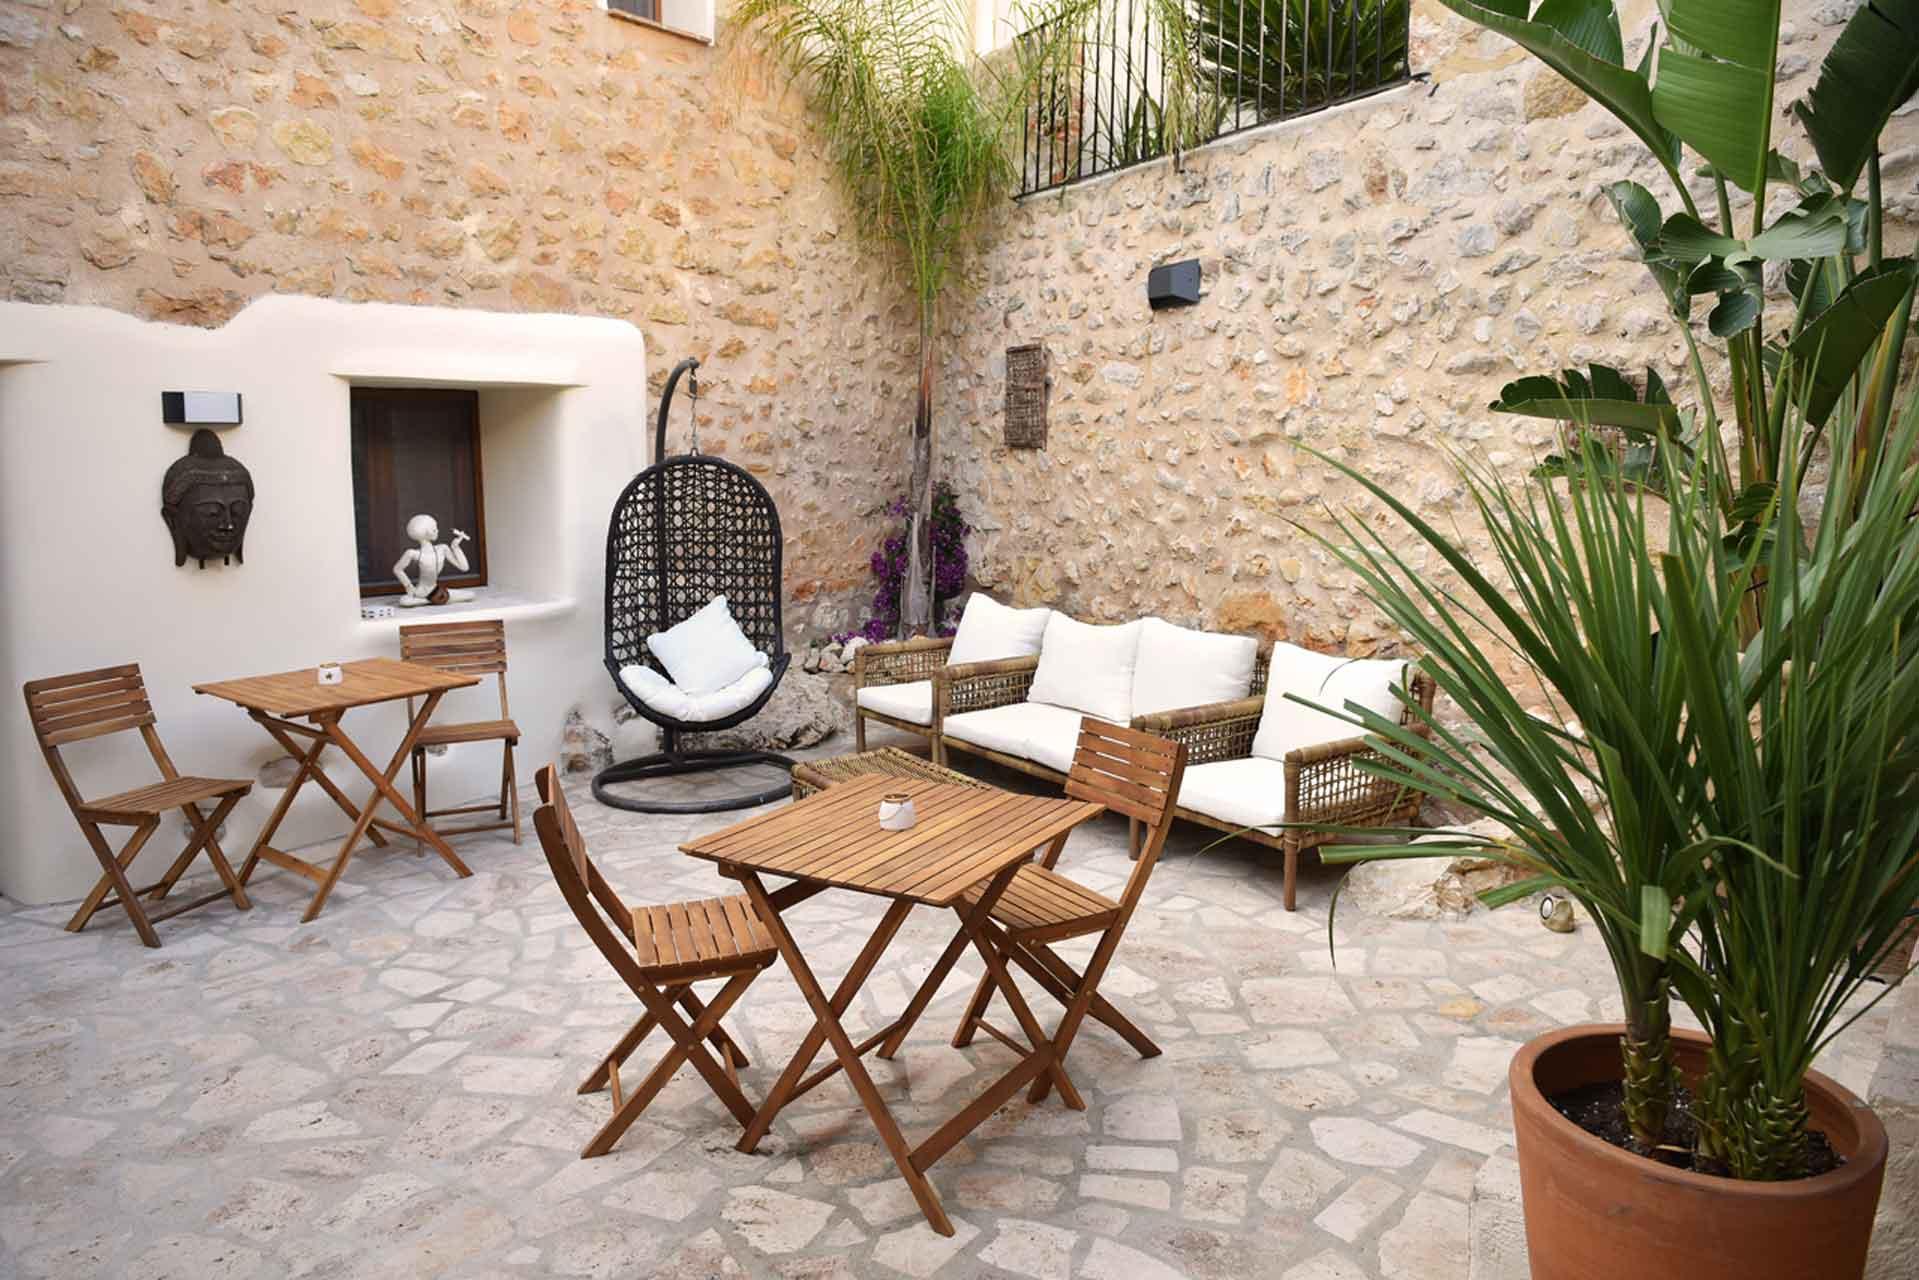 For sale: 6 bedroom house / villa in Lliber